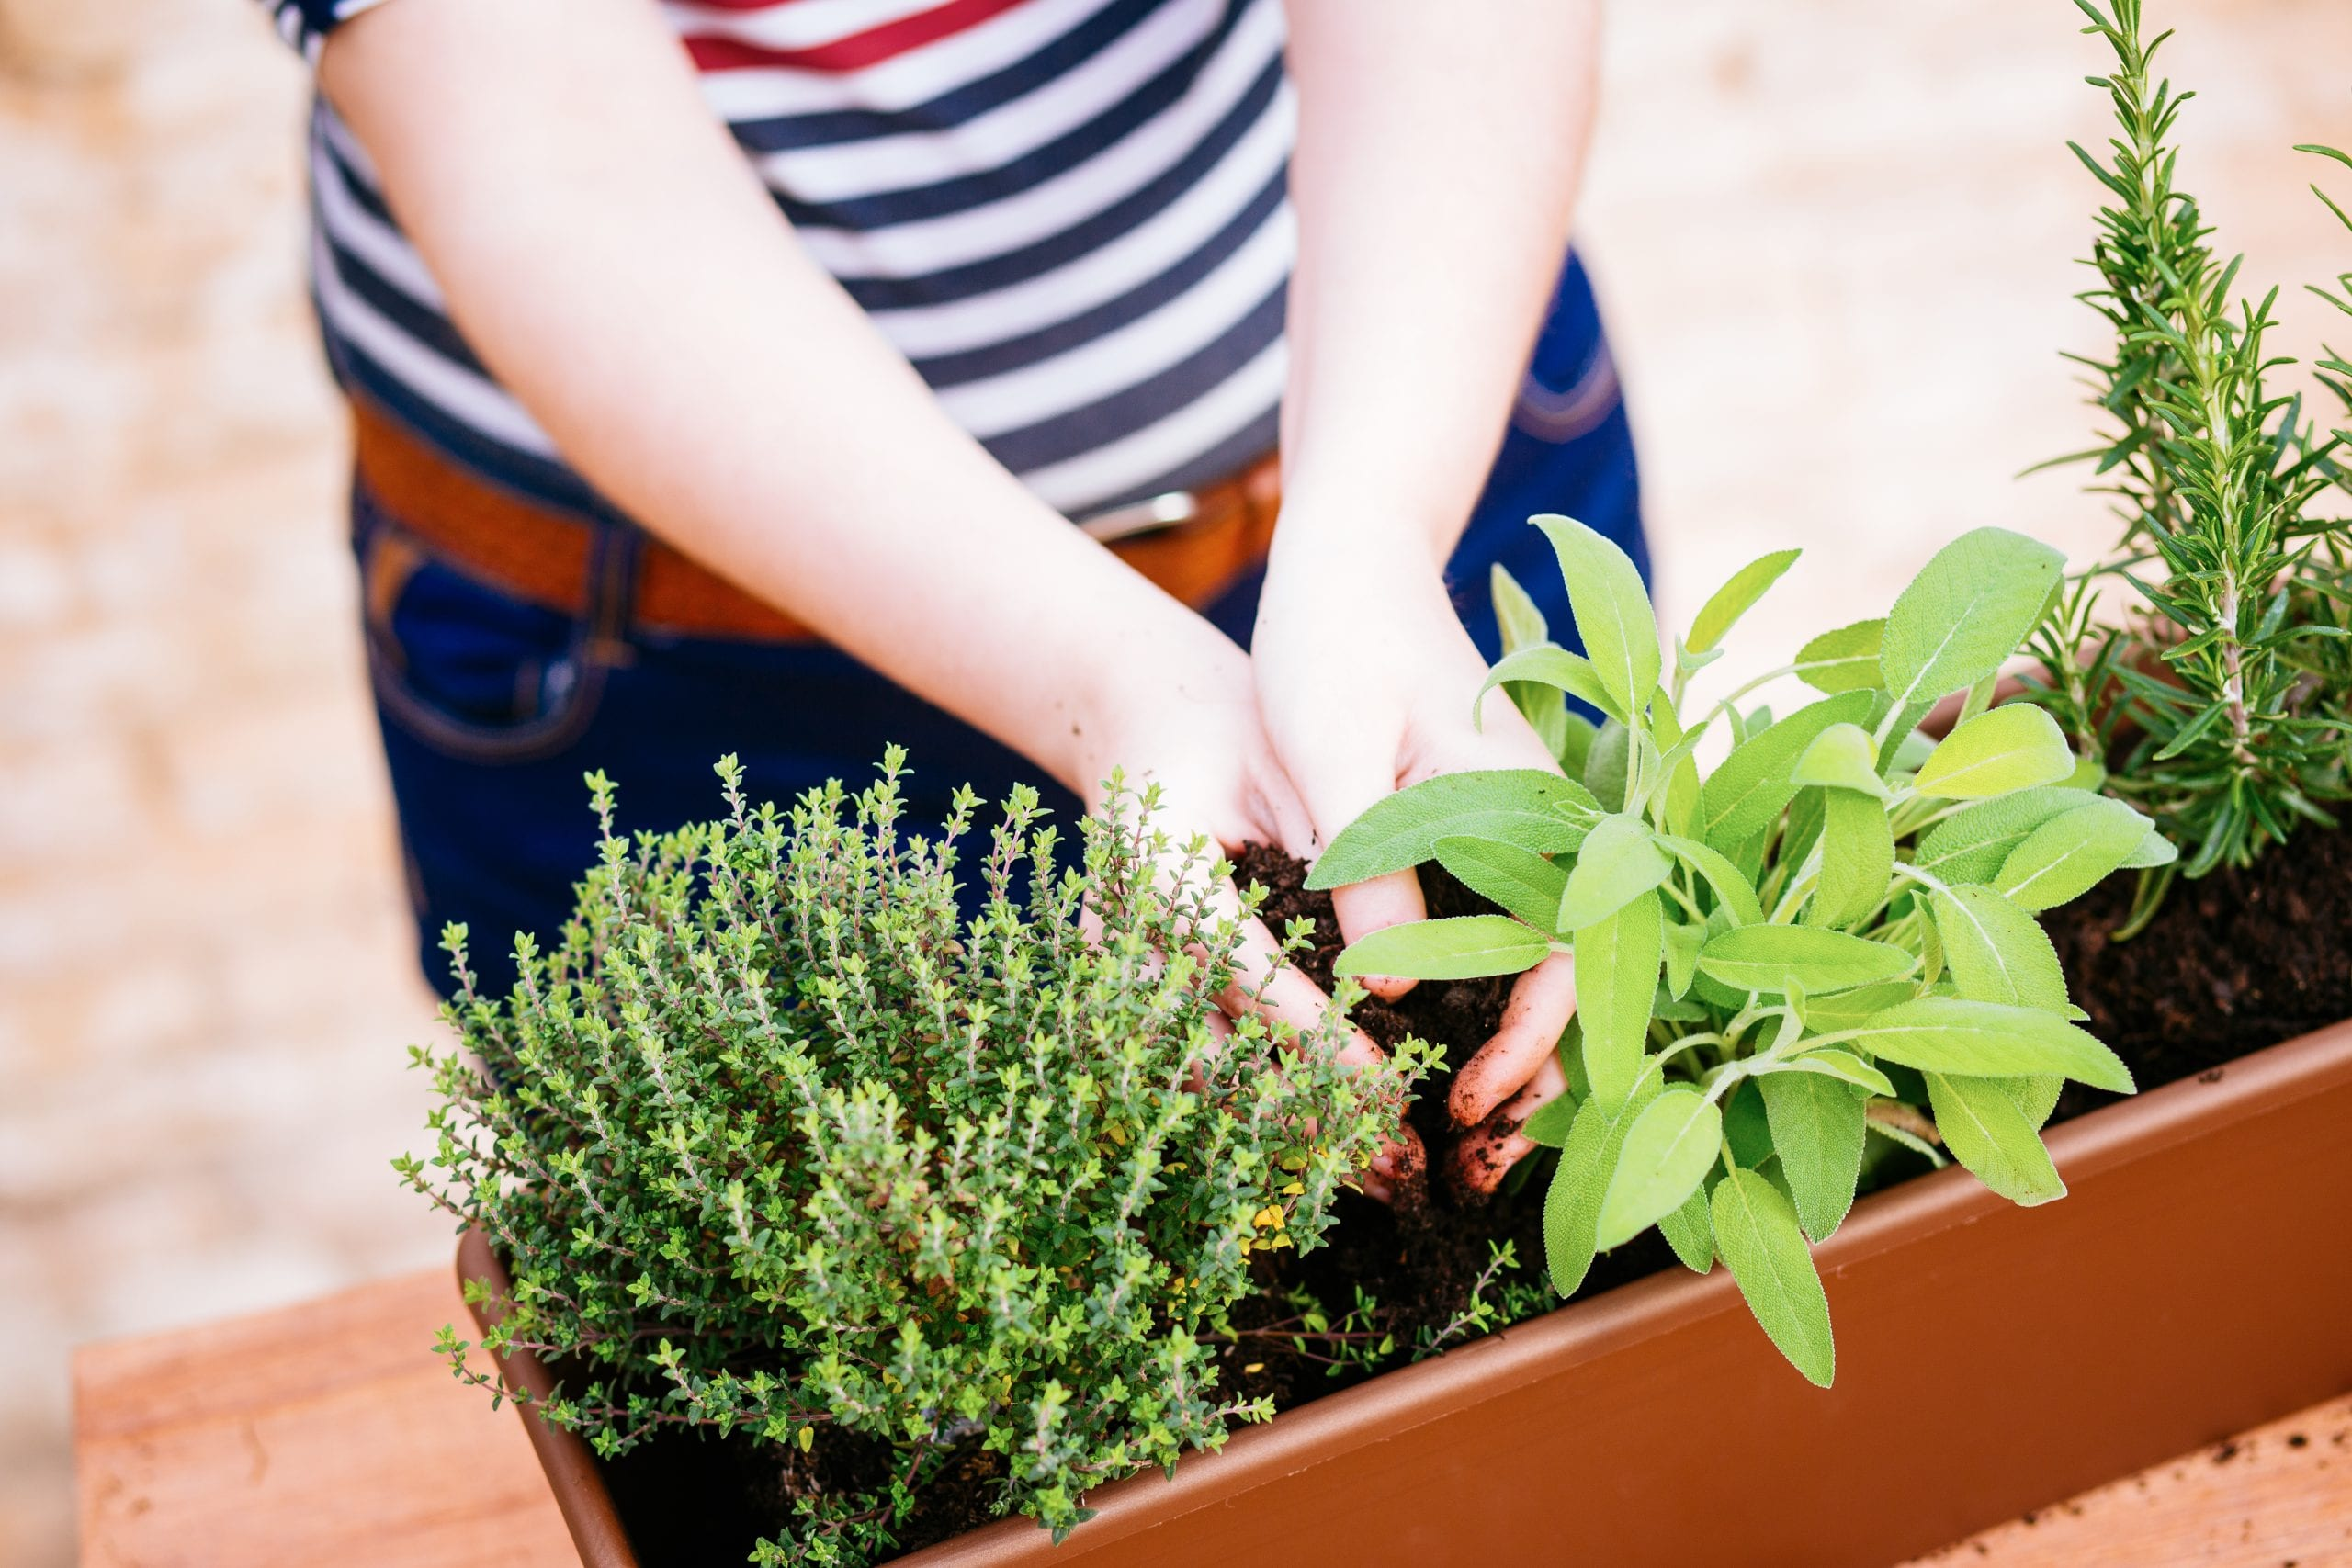 kräuterkunde - frische kräuter selber ziehen | miomente, Gartengerate ideen